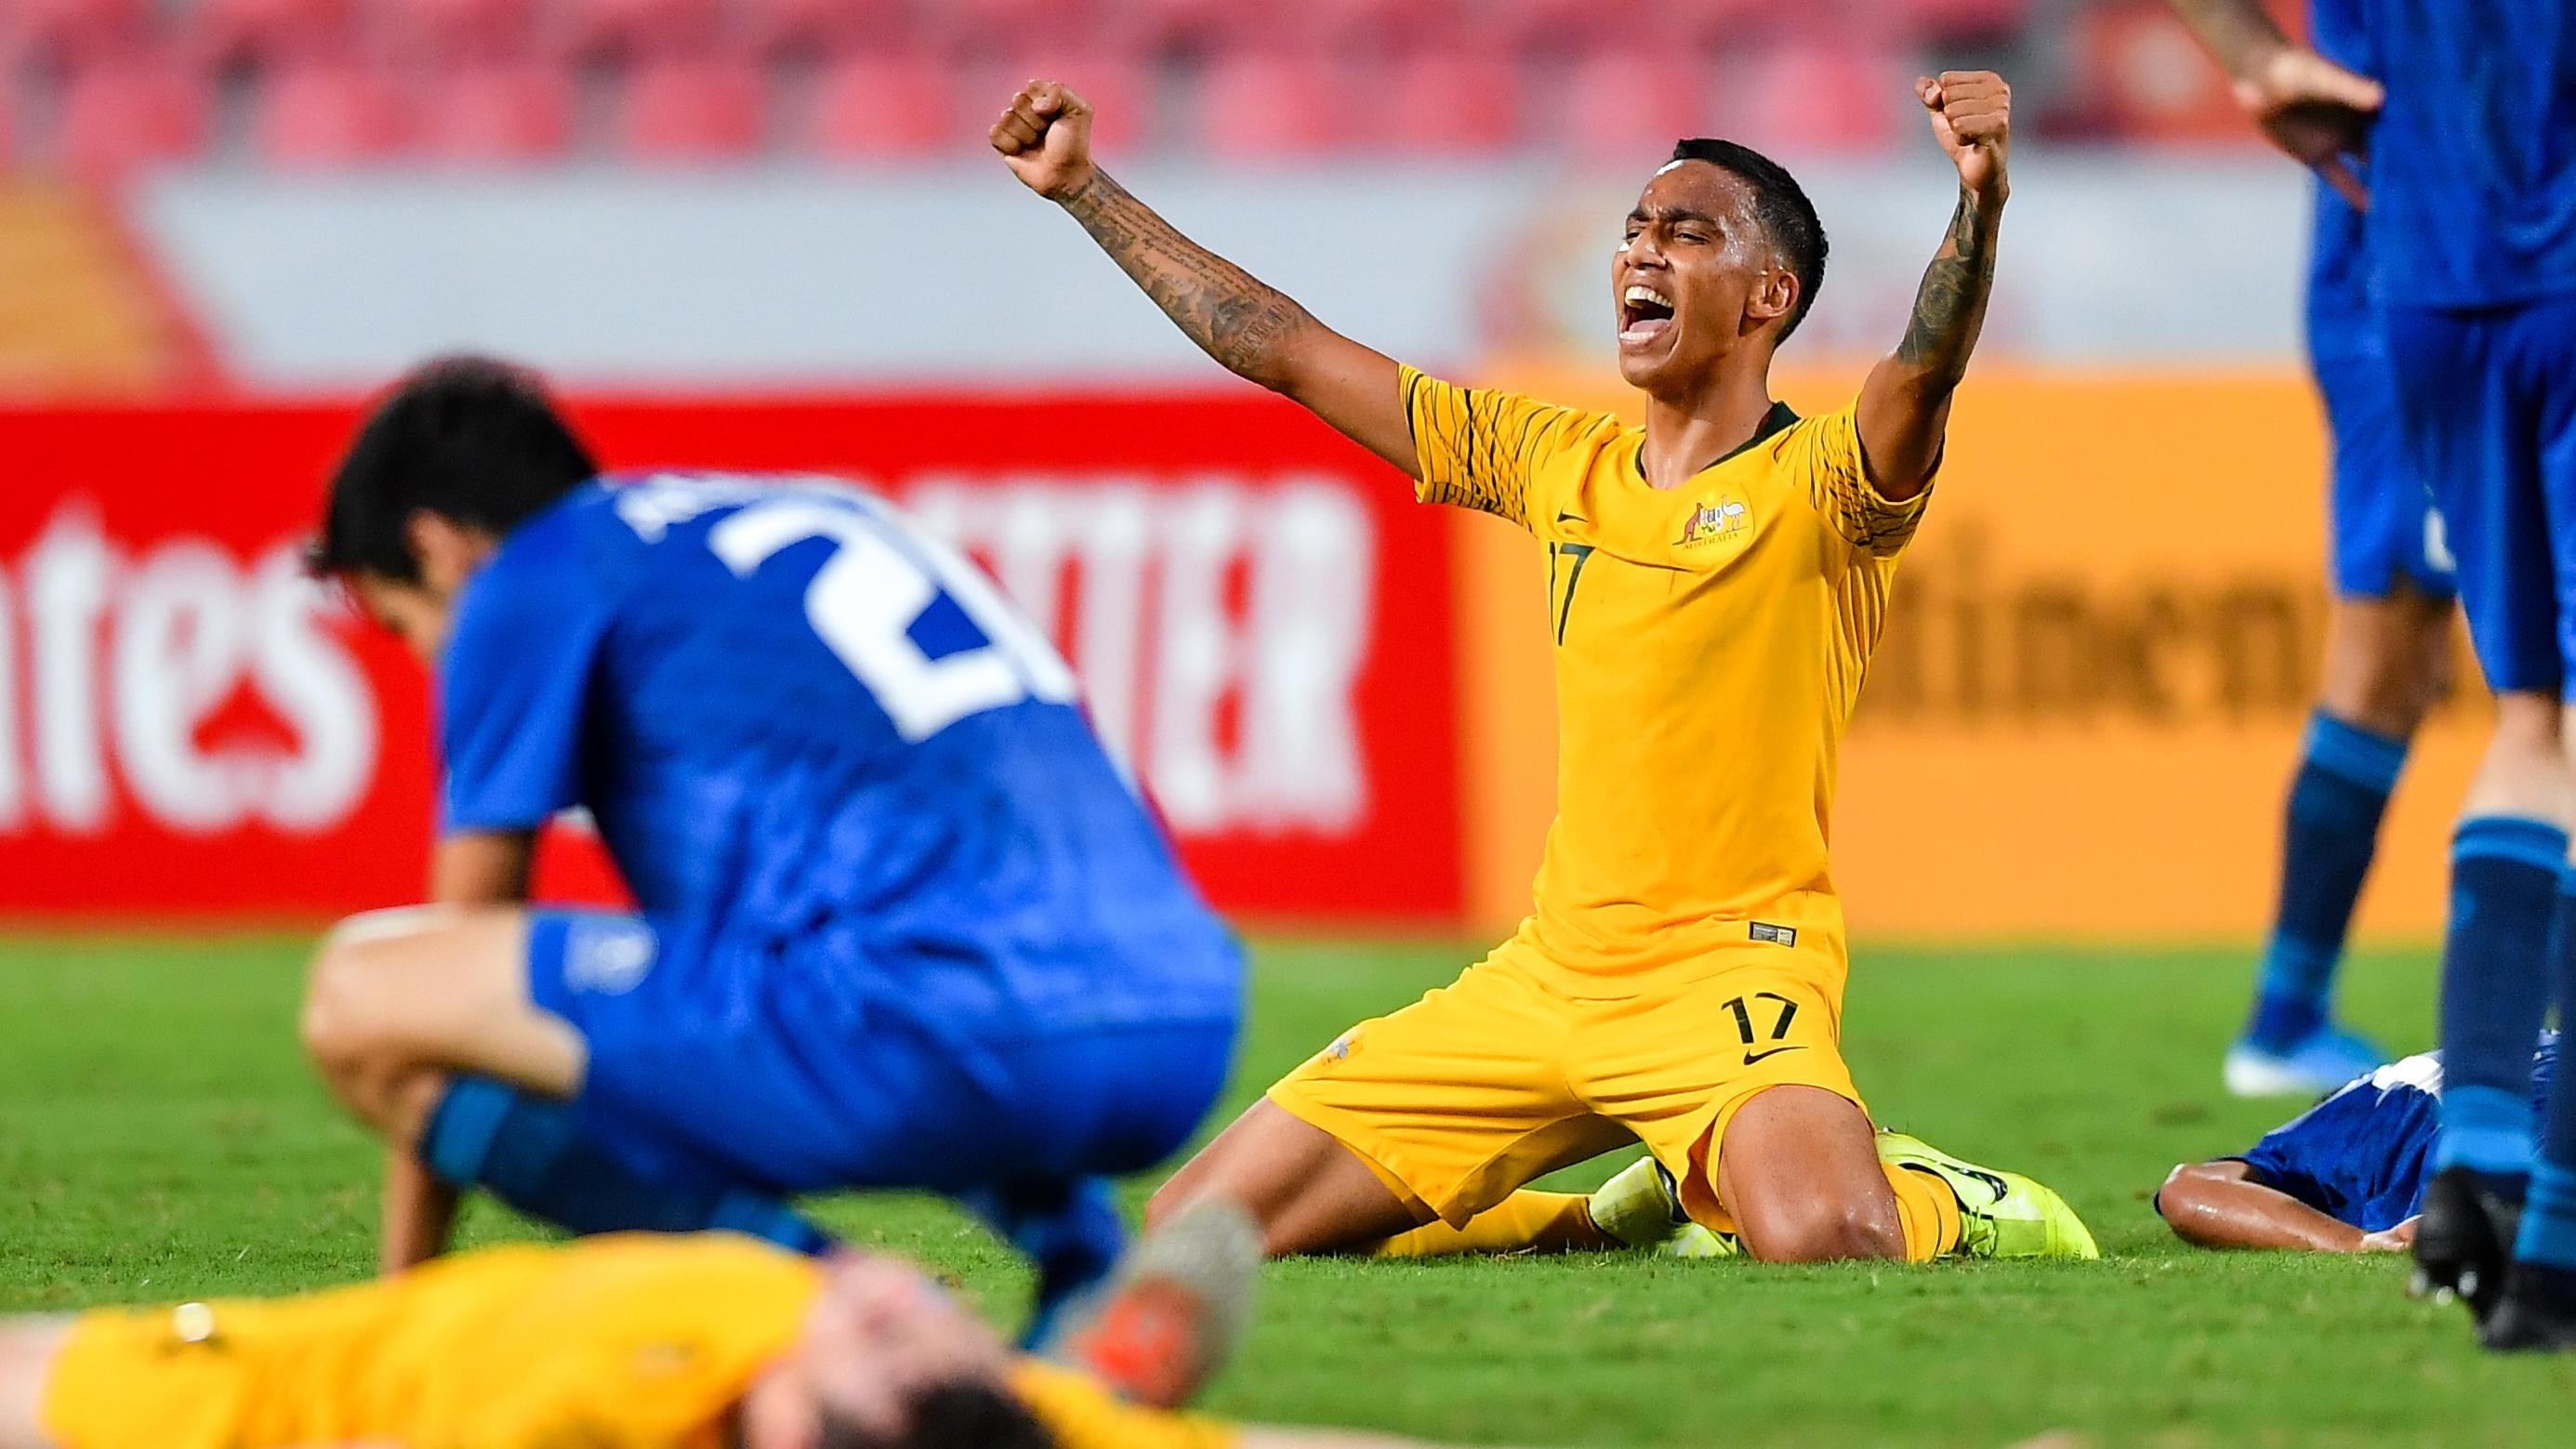 A-League and Australian football news LIVE: Olyroos secure spot at 2020 Olympics